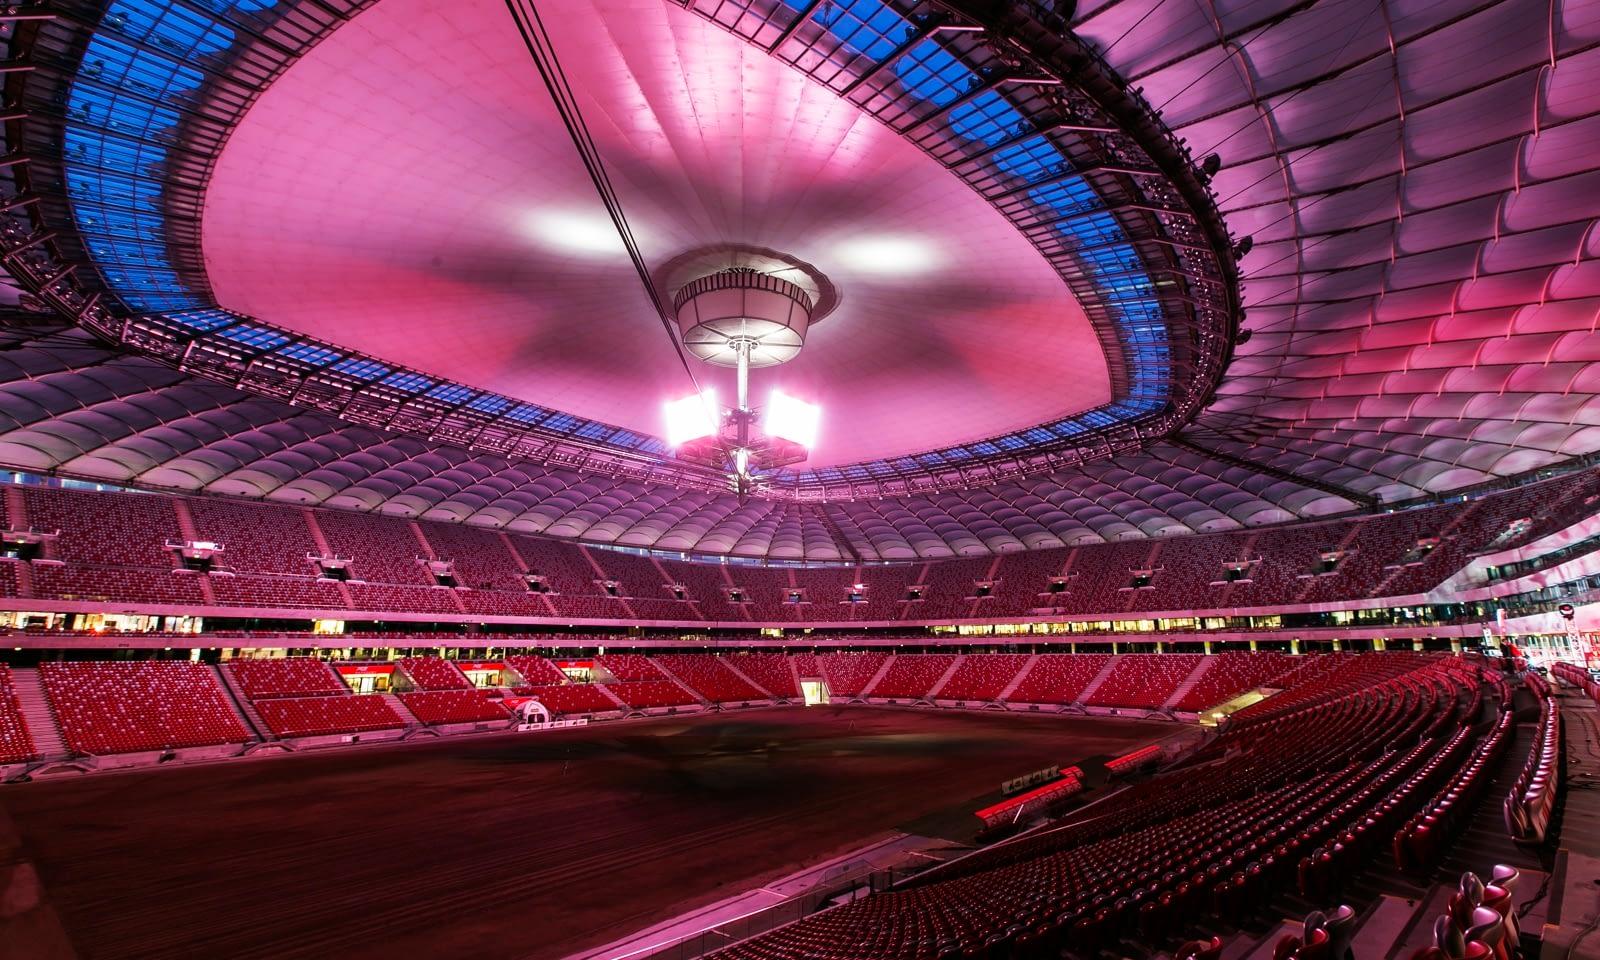 Brill AV Media stałym dostawcą usług AVL (audio, video, light) PGE Narodowy Stadion